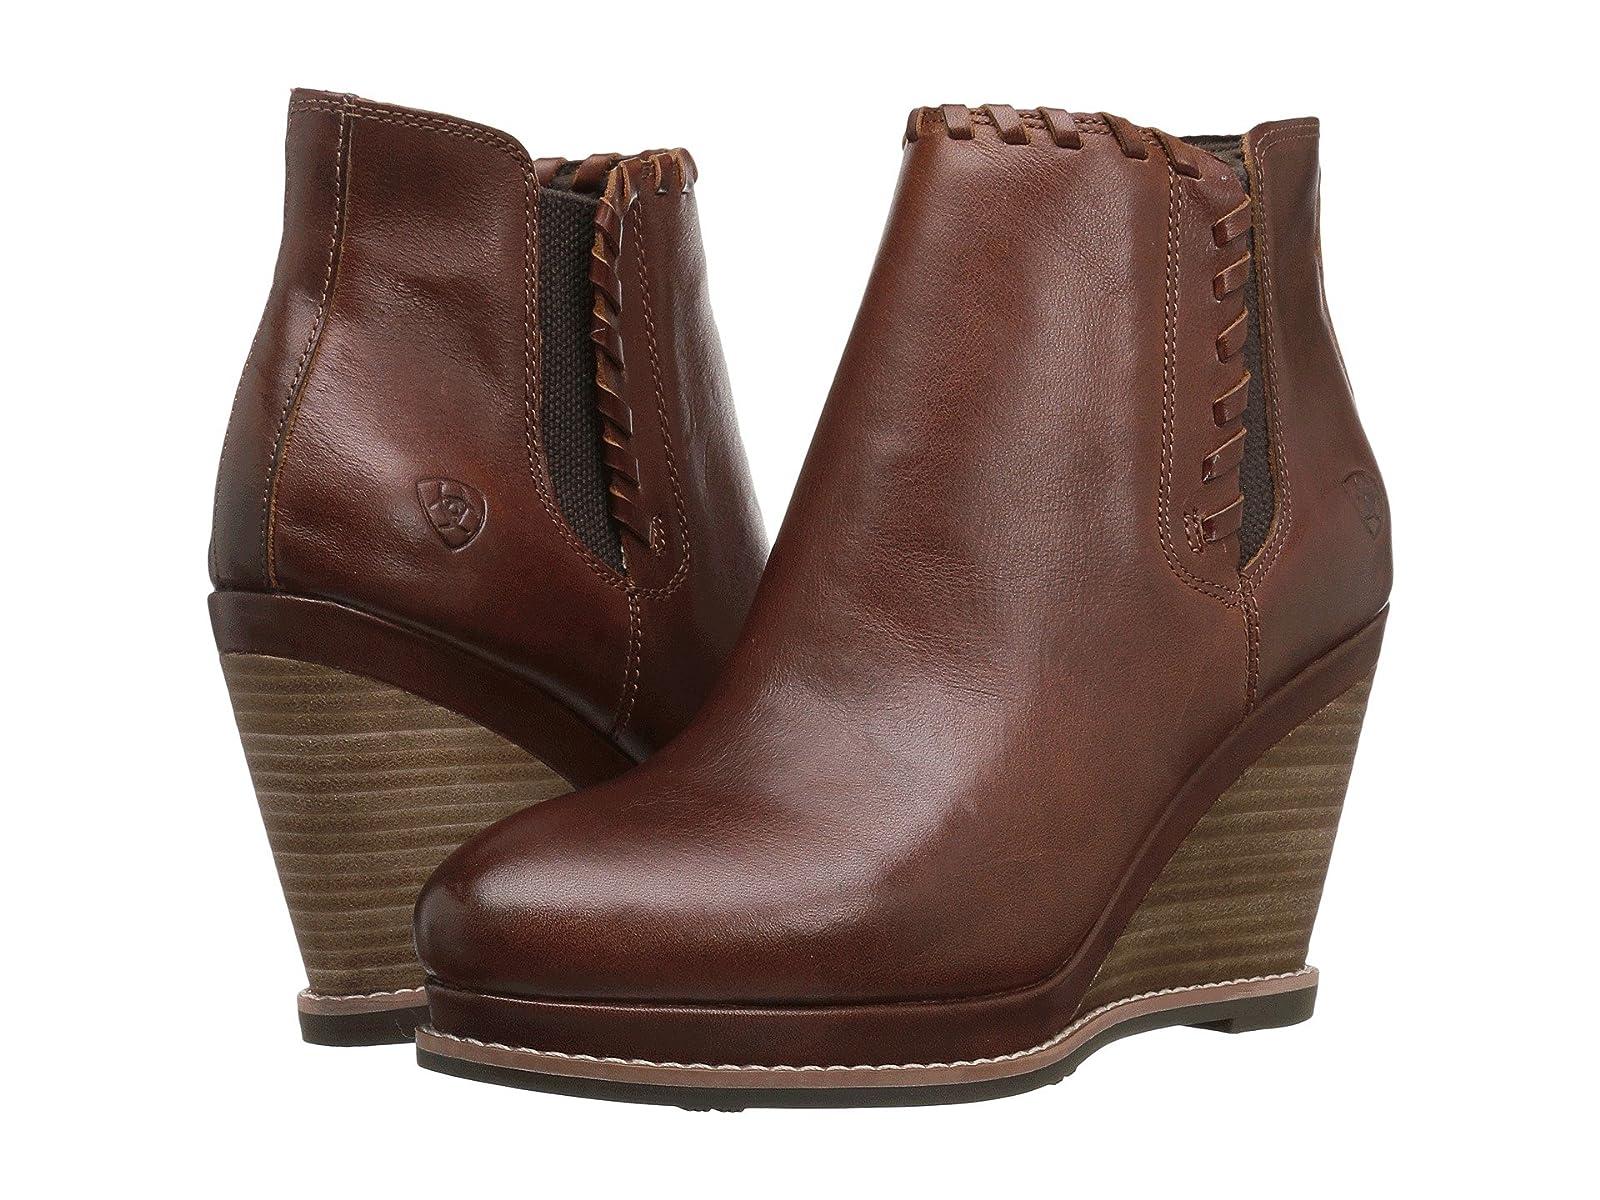 Ariat BelleCheap and distinctive eye-catching shoes